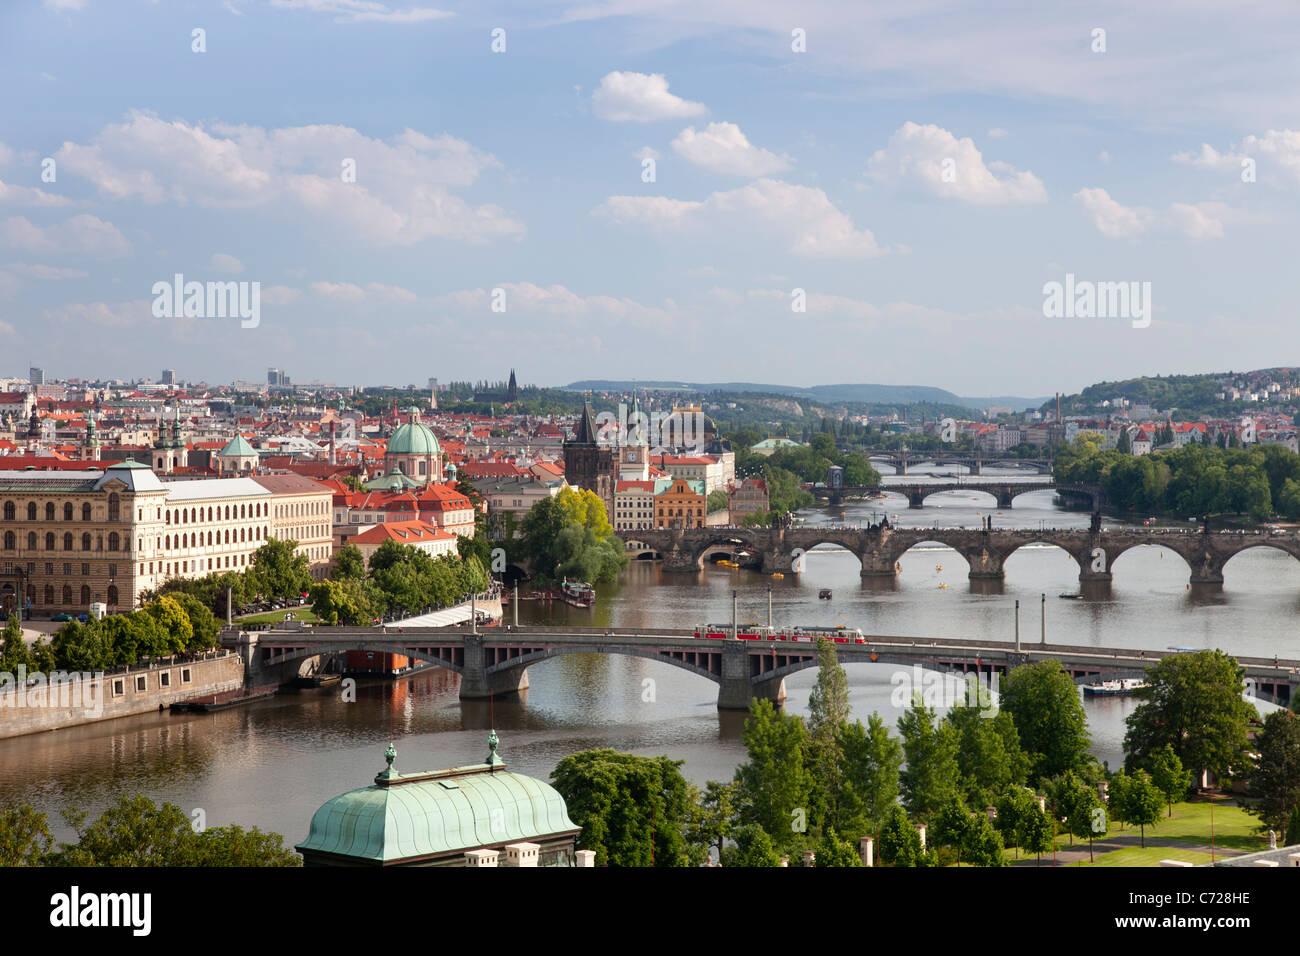 View of the River Vltava and bridges, Prague, Czech Republic - Stock Image